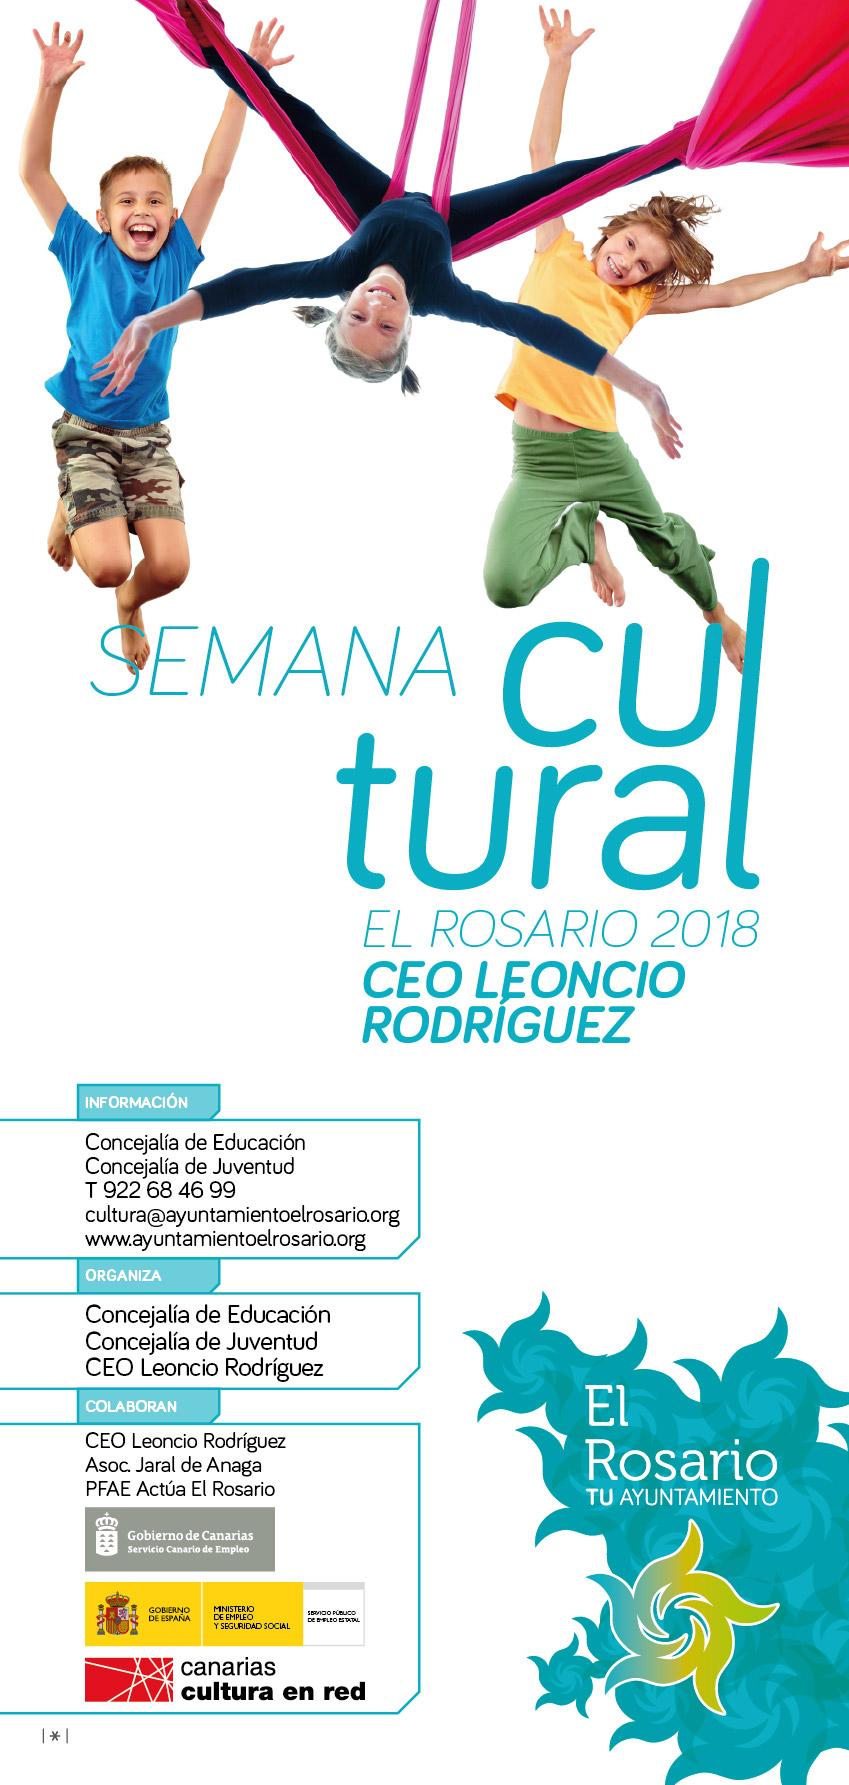 SEMANA_CULTURAL_CEO_LEONCIO_RODRIGUEZ-20180528-OCTAVILLA-20180524-anverso-01af-redes